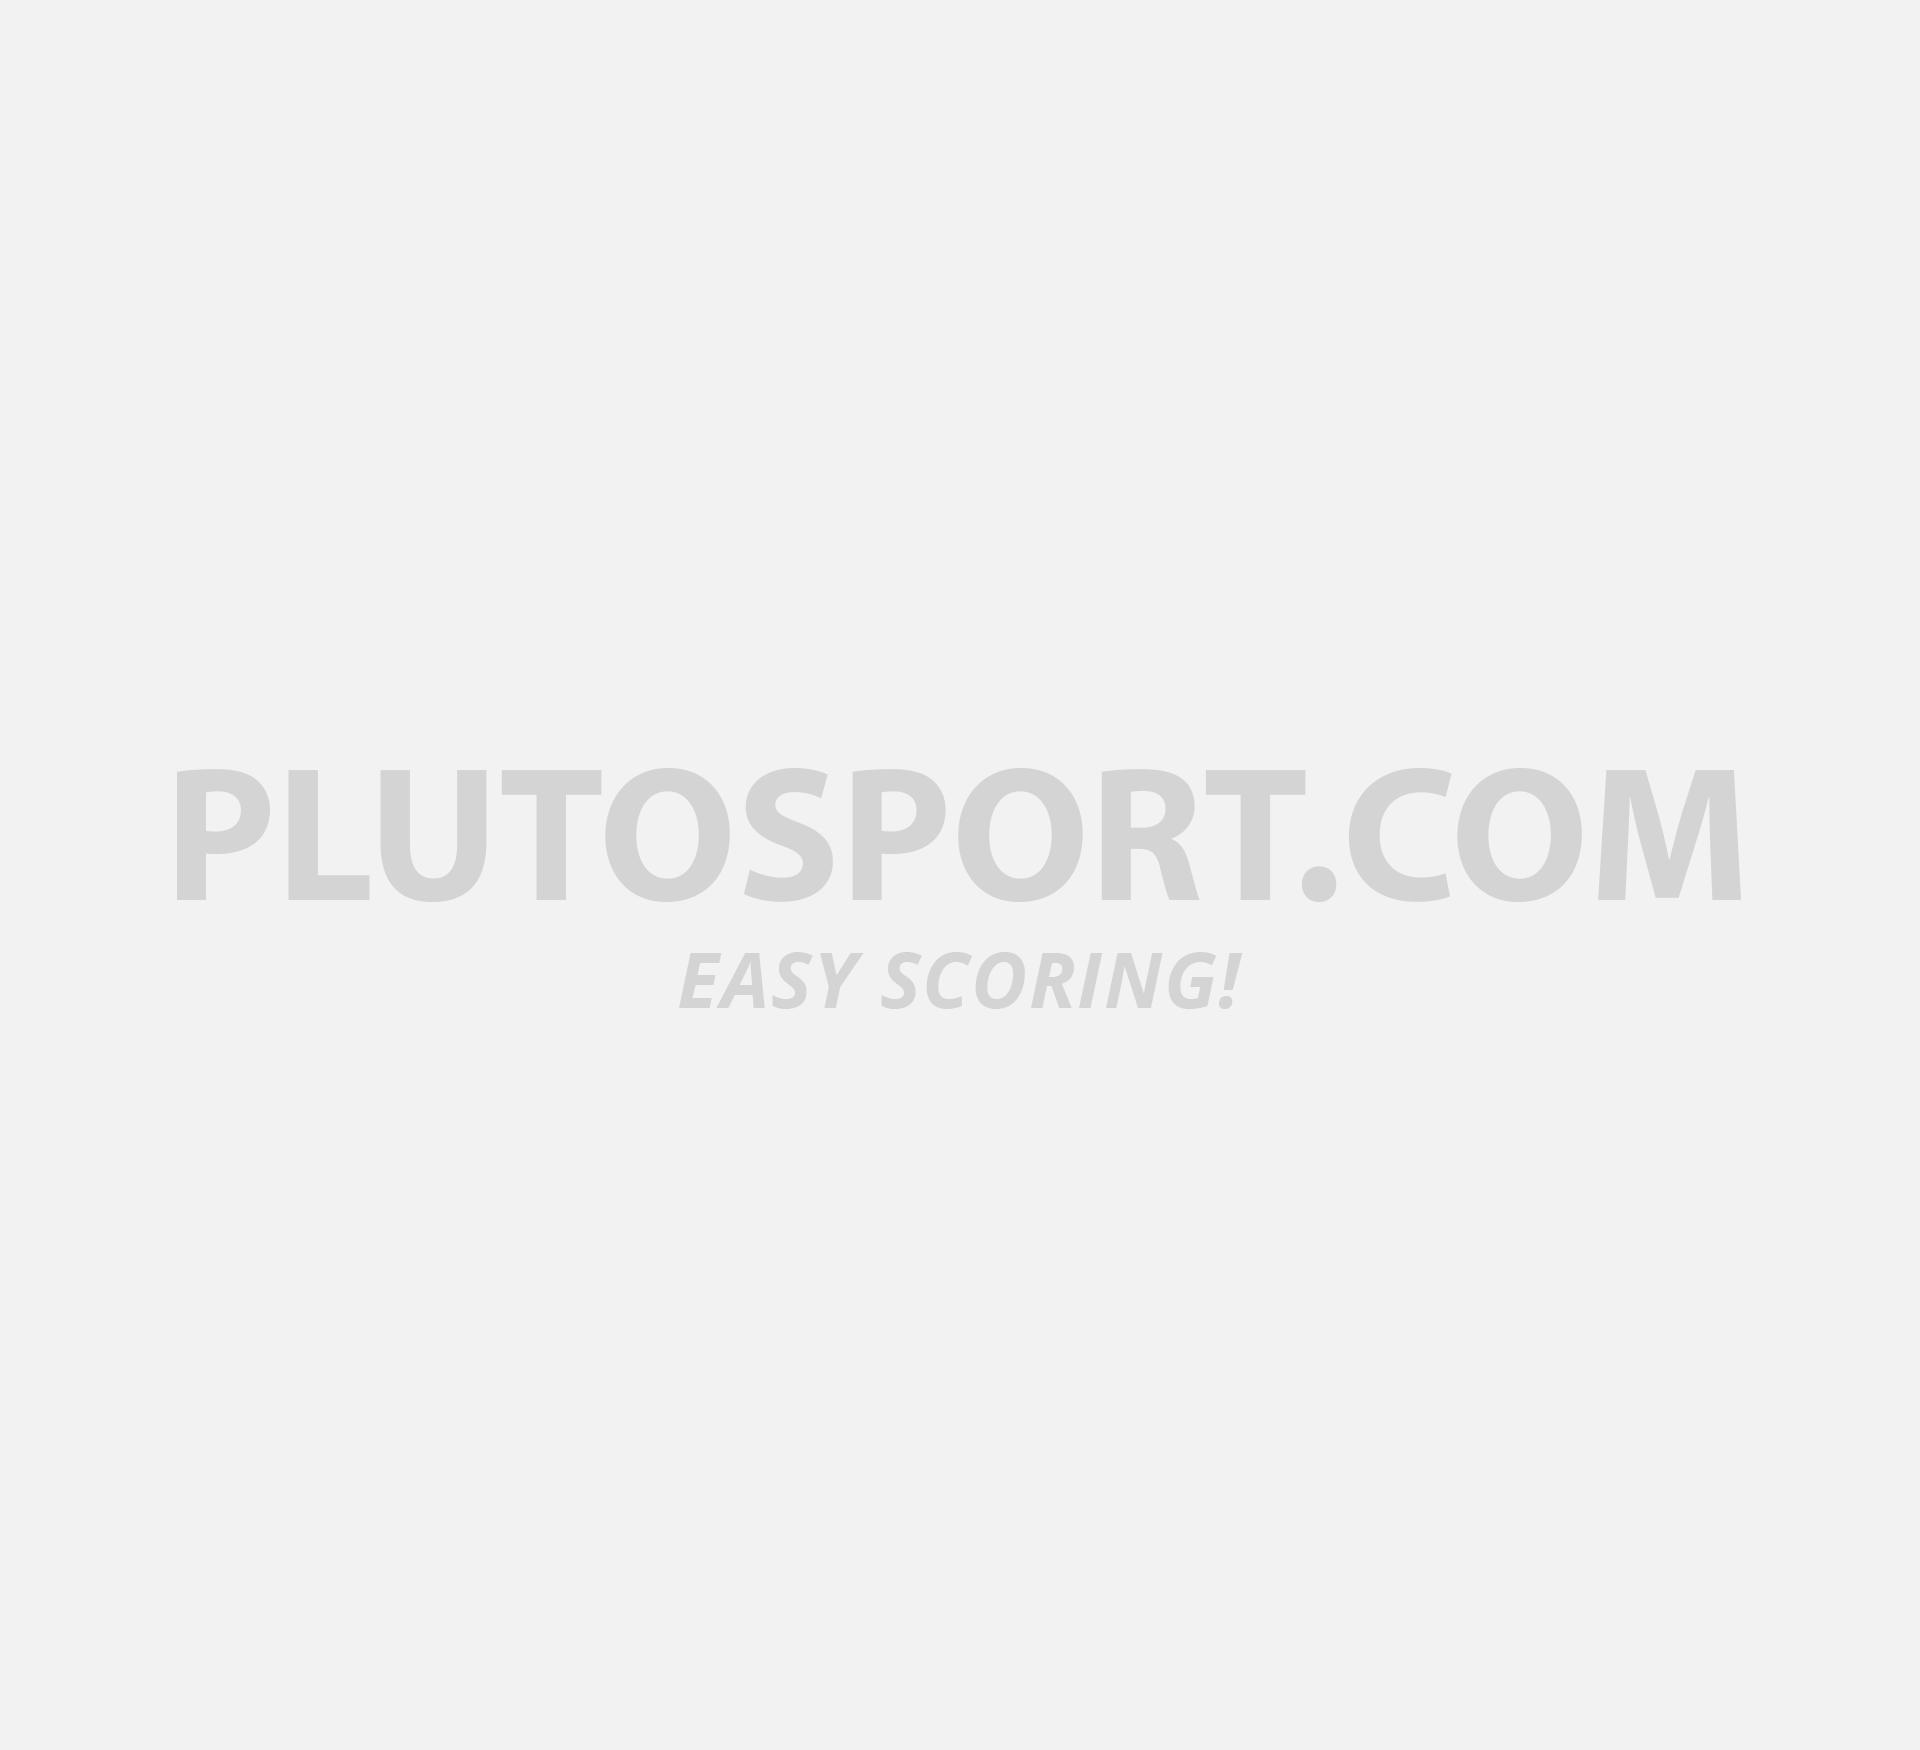 22ac44516c Nike Magista Onda FG Football Shoes Junior - Boots fixed stud - Shoes -  Football - Sports | Plutosport